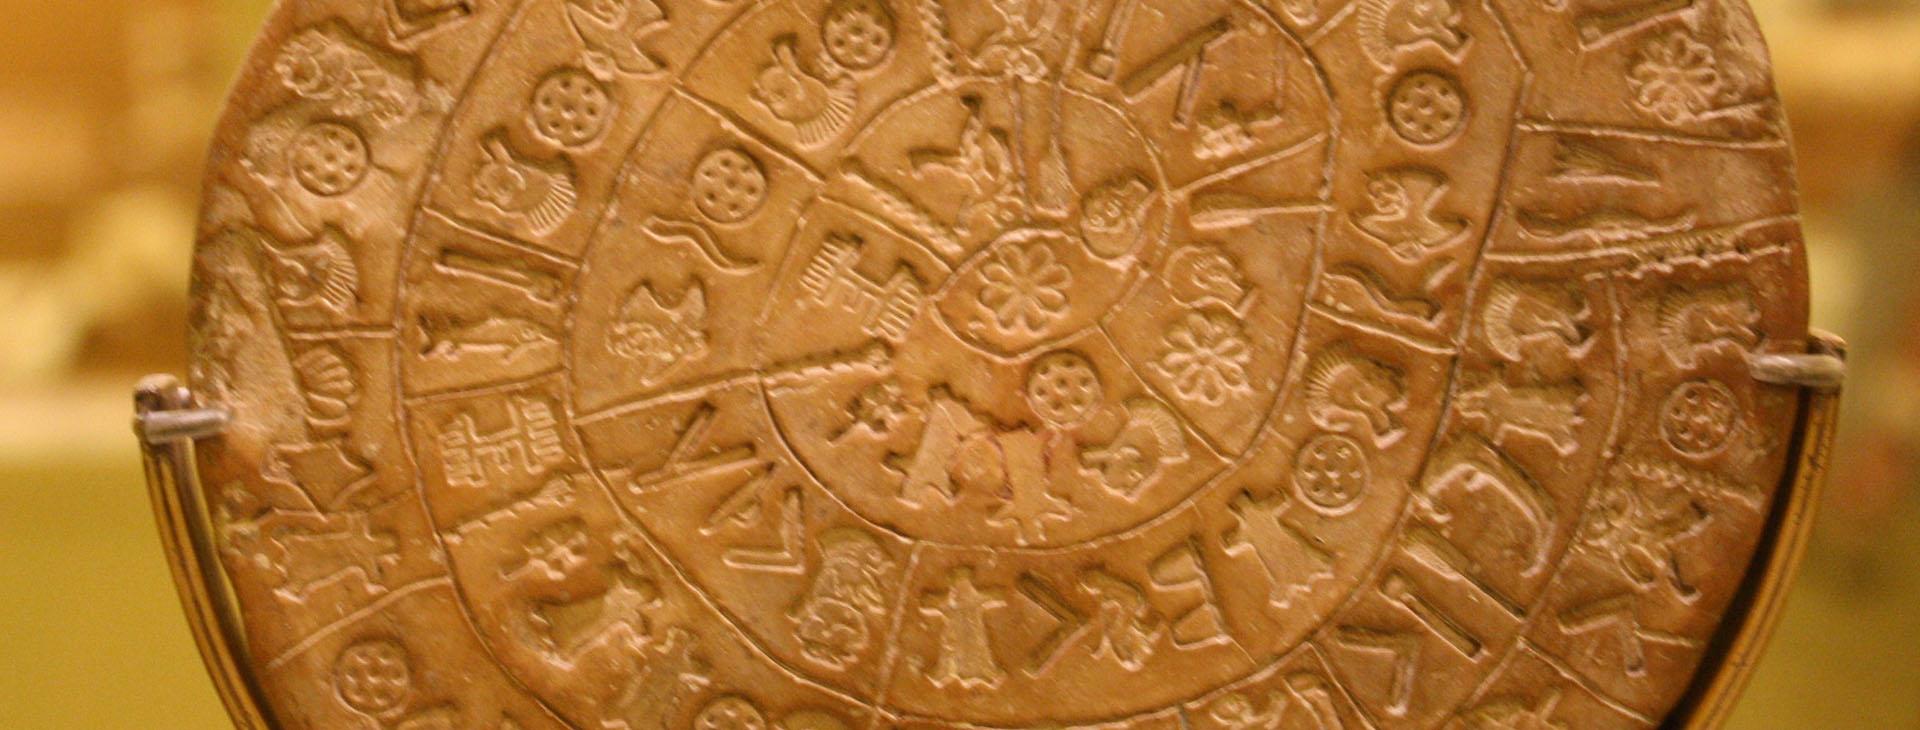 Phaestos disk side A, Heraklion Archaeological Museum